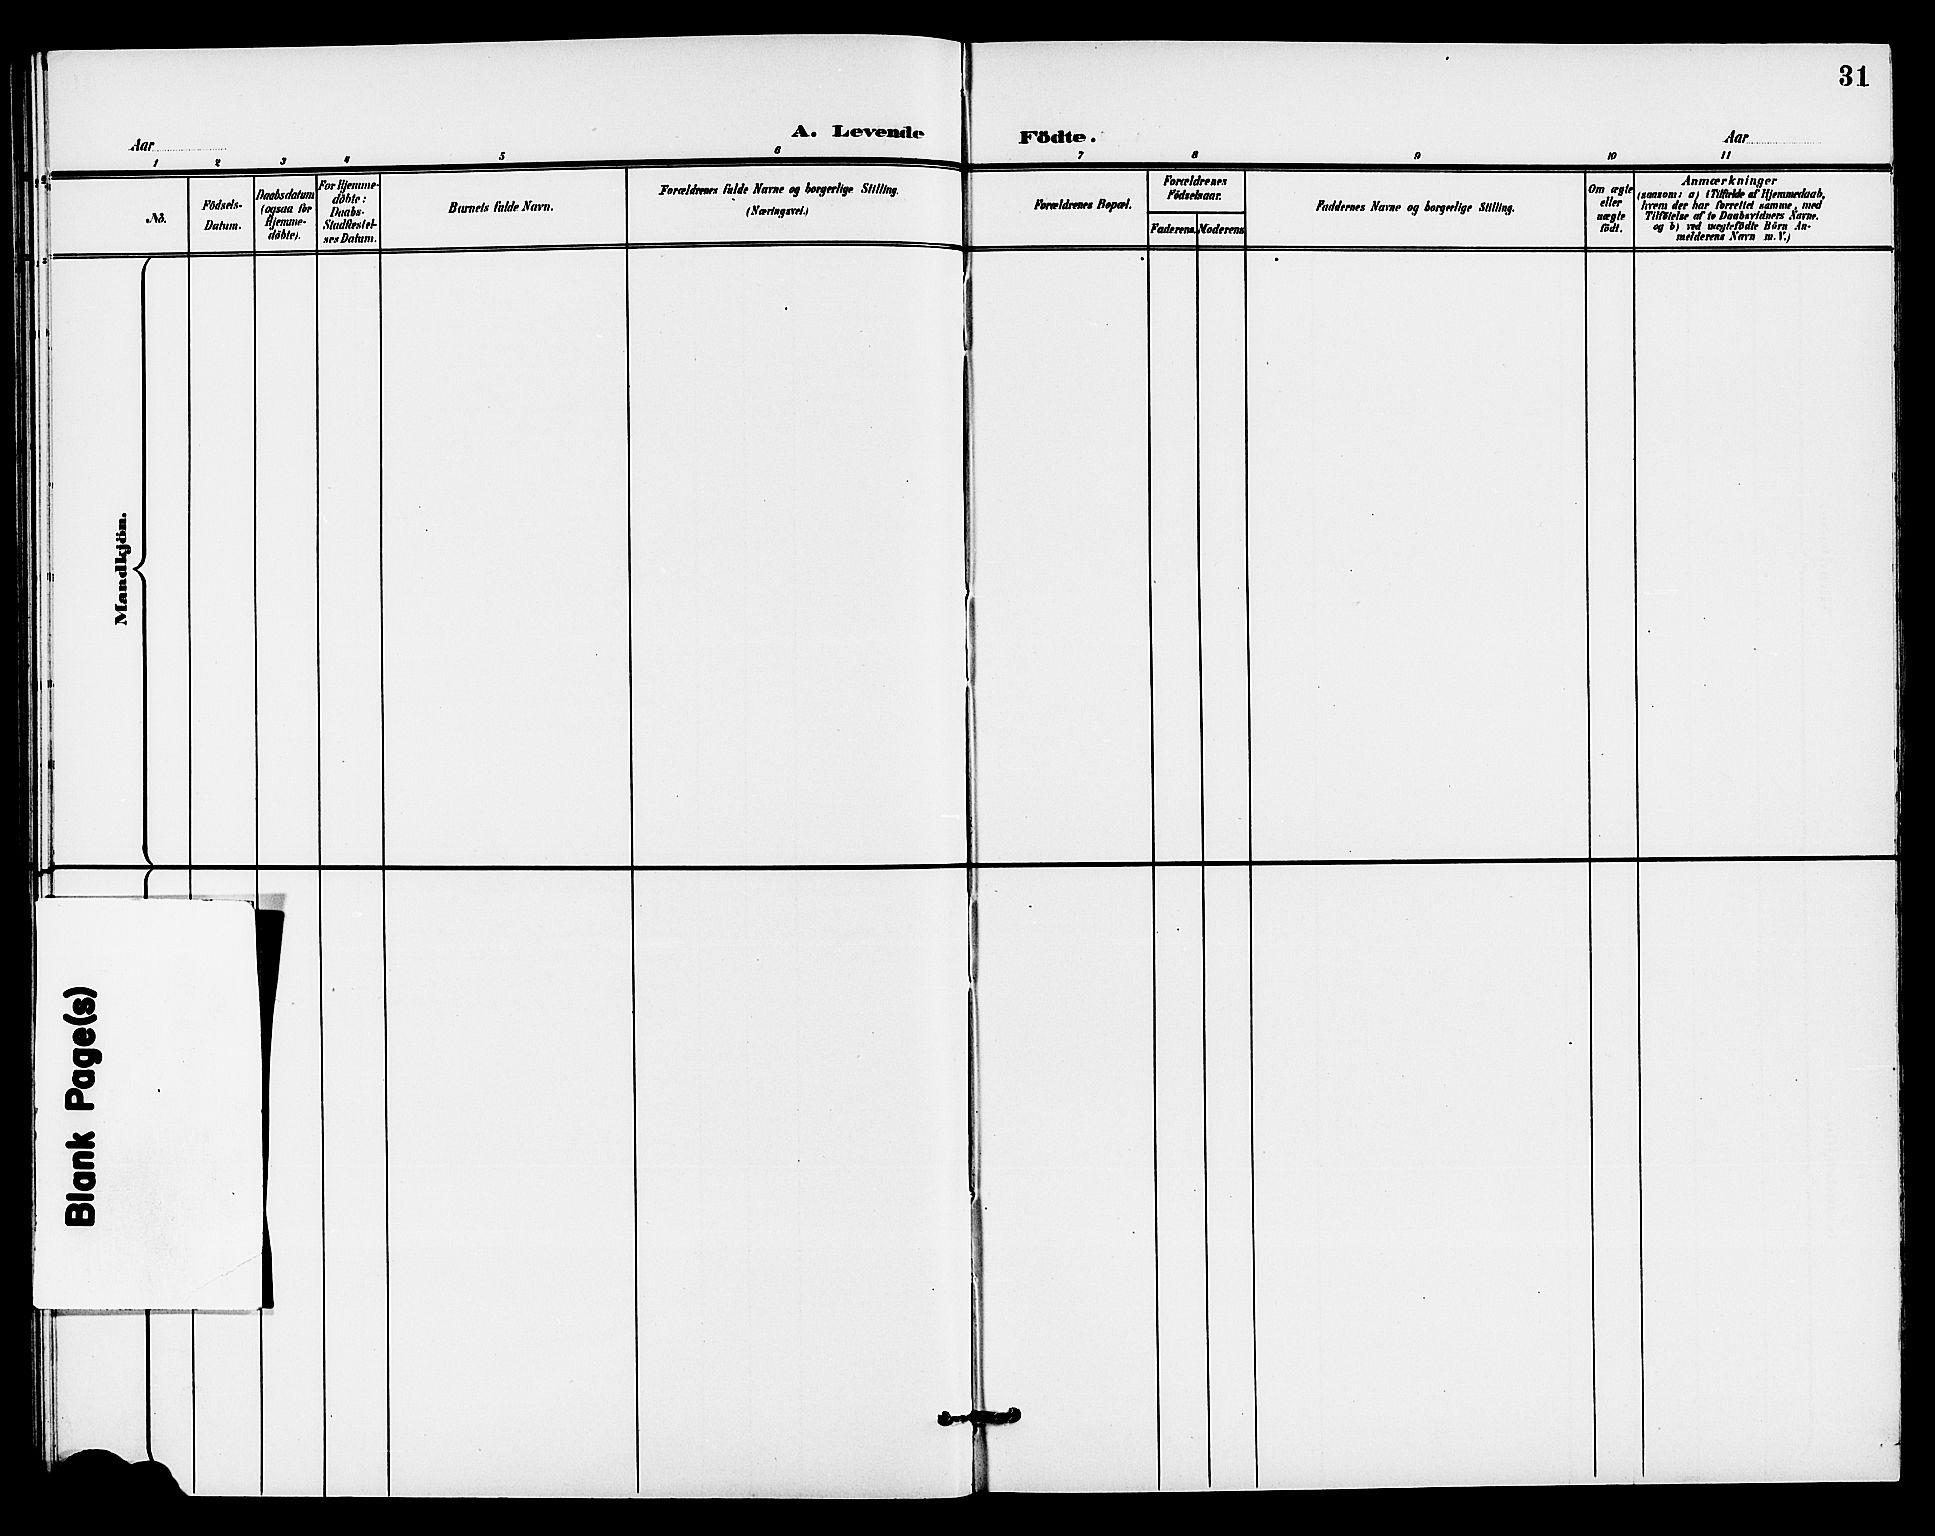 SAKO, Holla kirkebøker, G/Gb/L0002: Klokkerbok nr. II 2, 1897-1913, s. 31